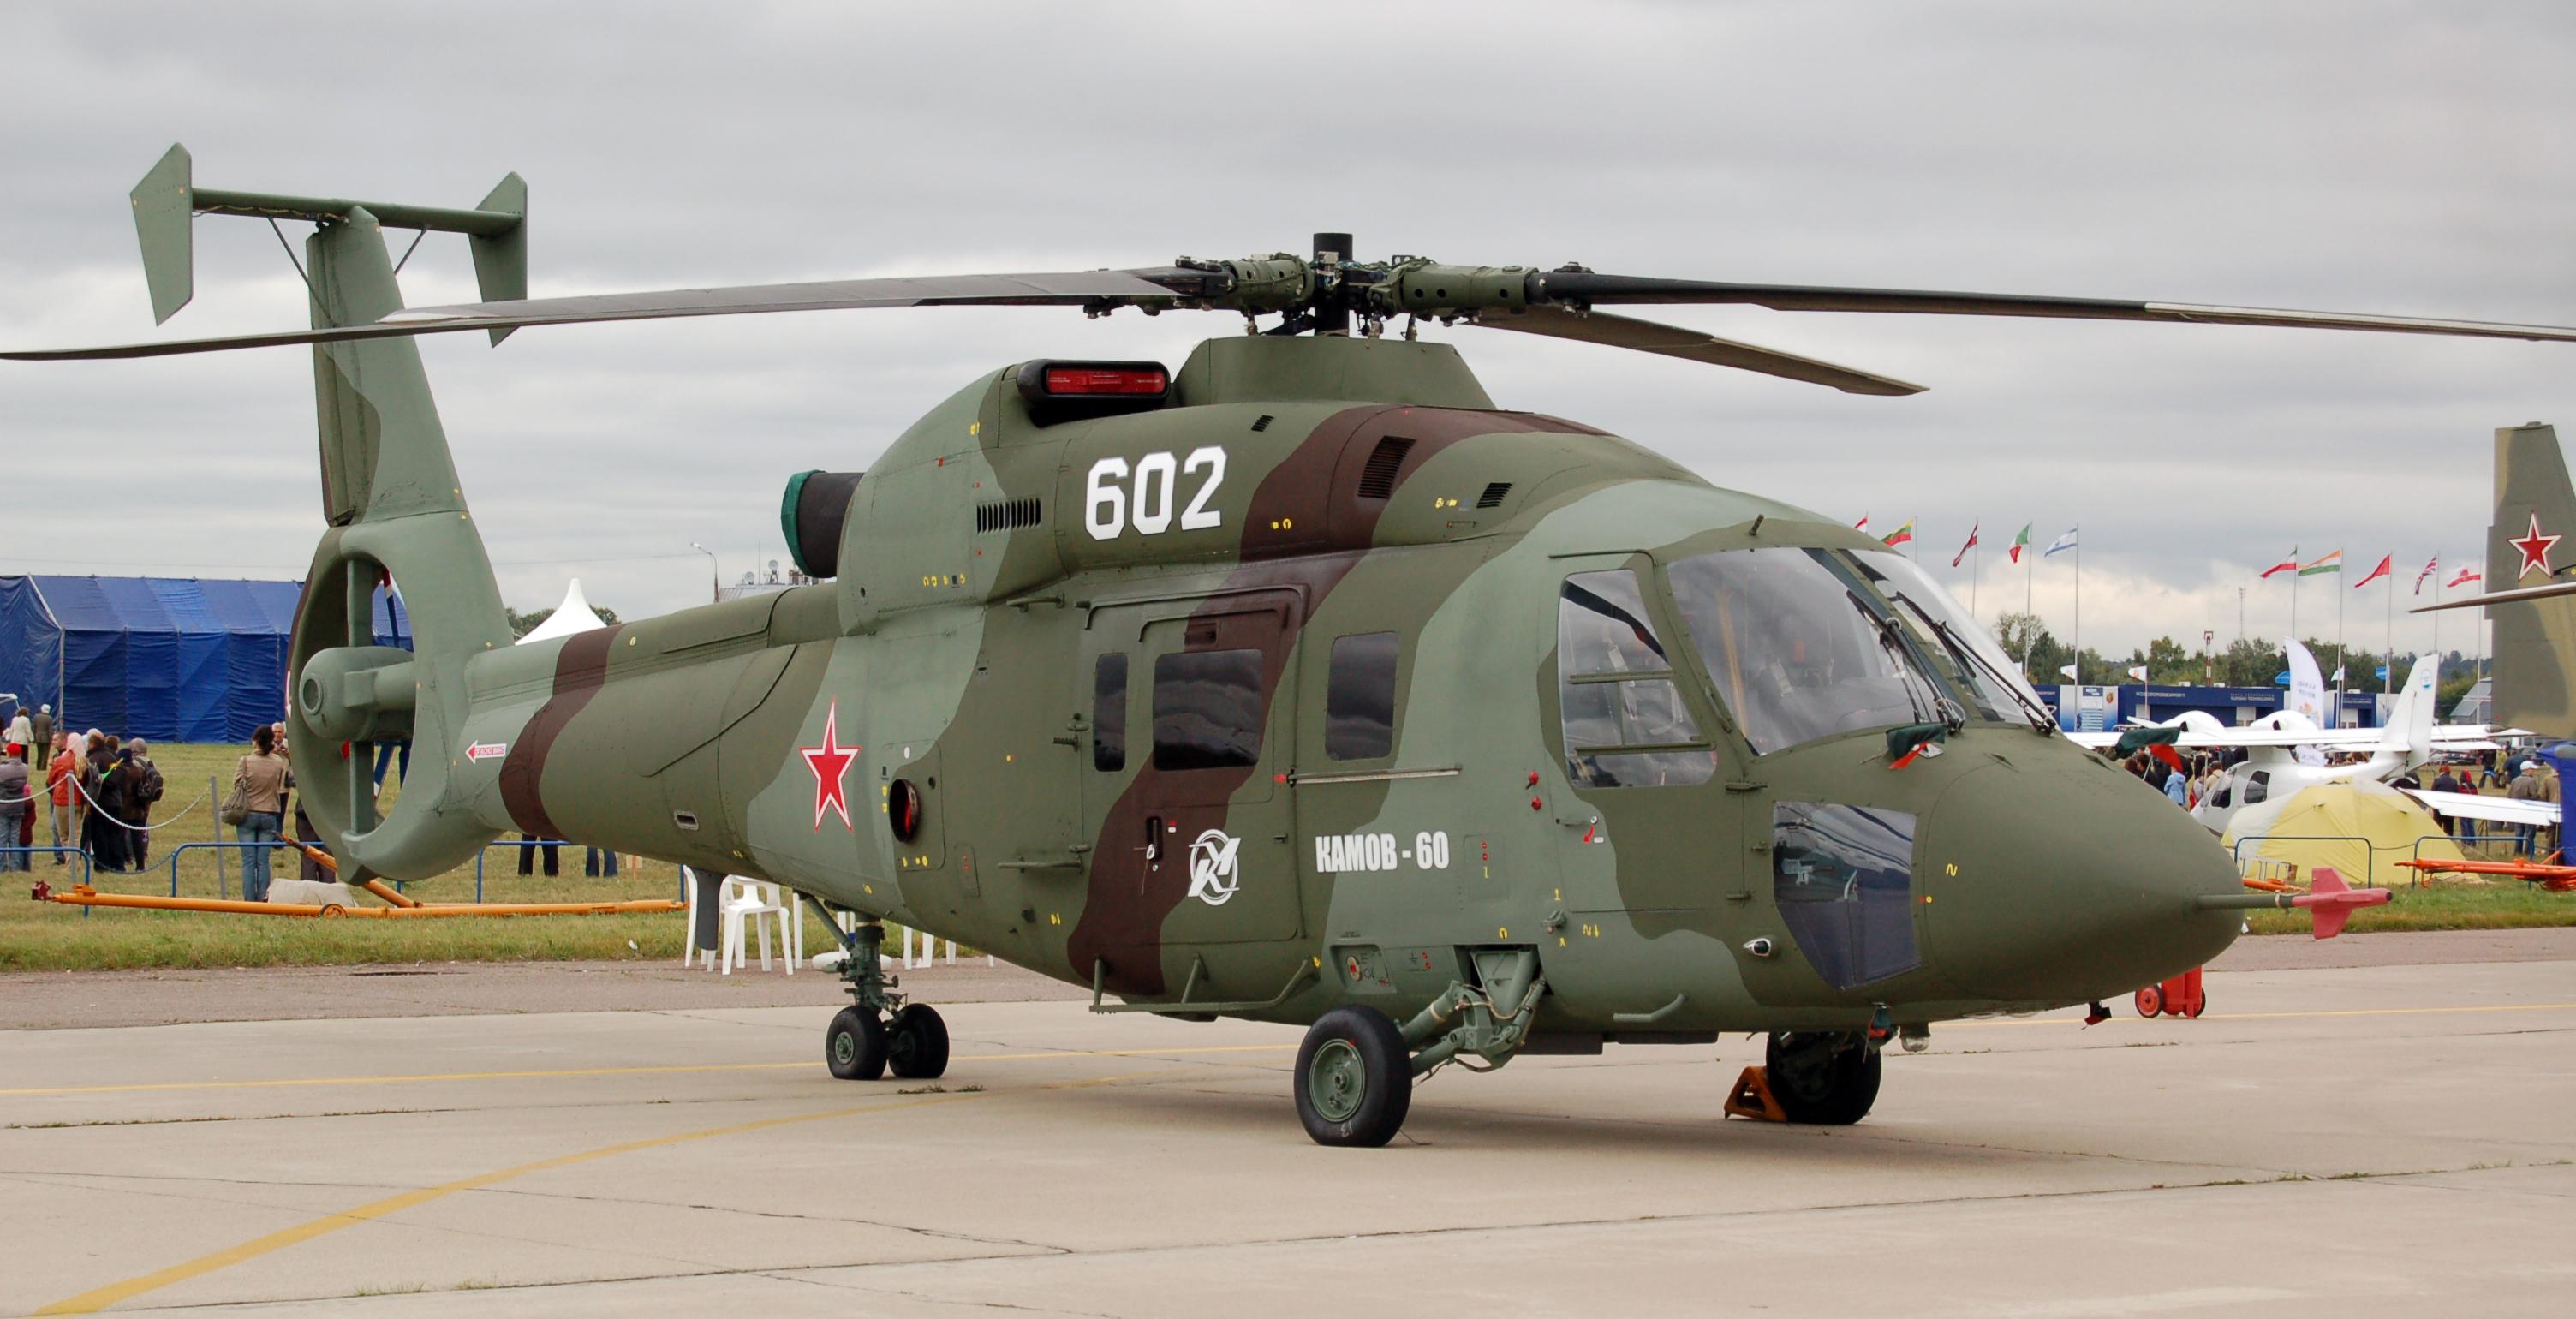 De Helicópteros Argentos Kamov_Ka_60_maks2009